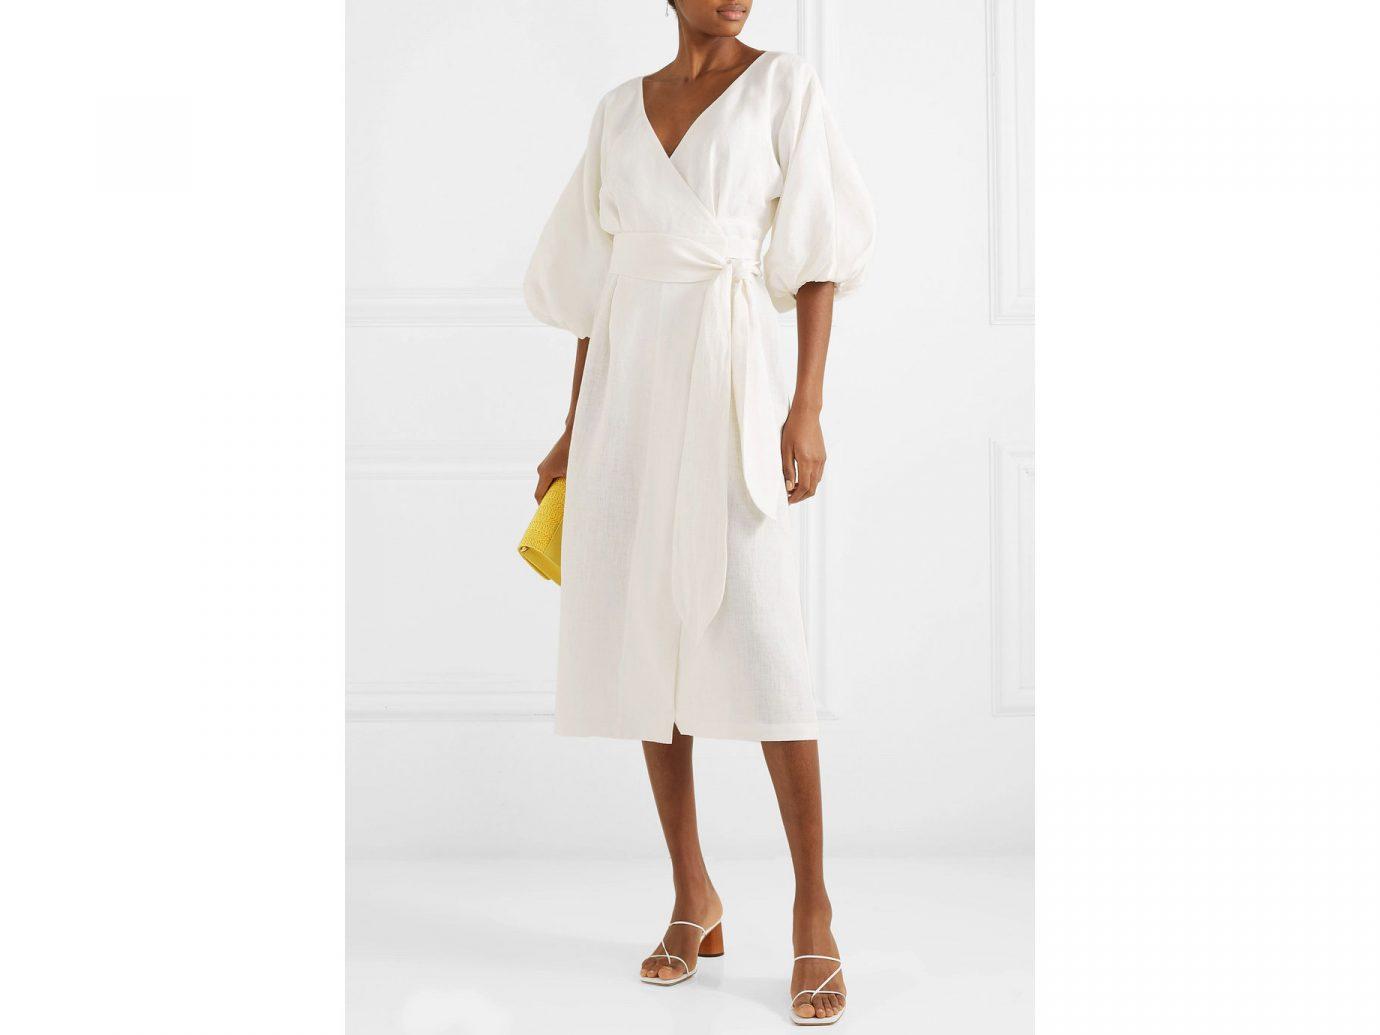 Dress: Mara Hoffman + Net Sustain Francesca hemp wrap dress